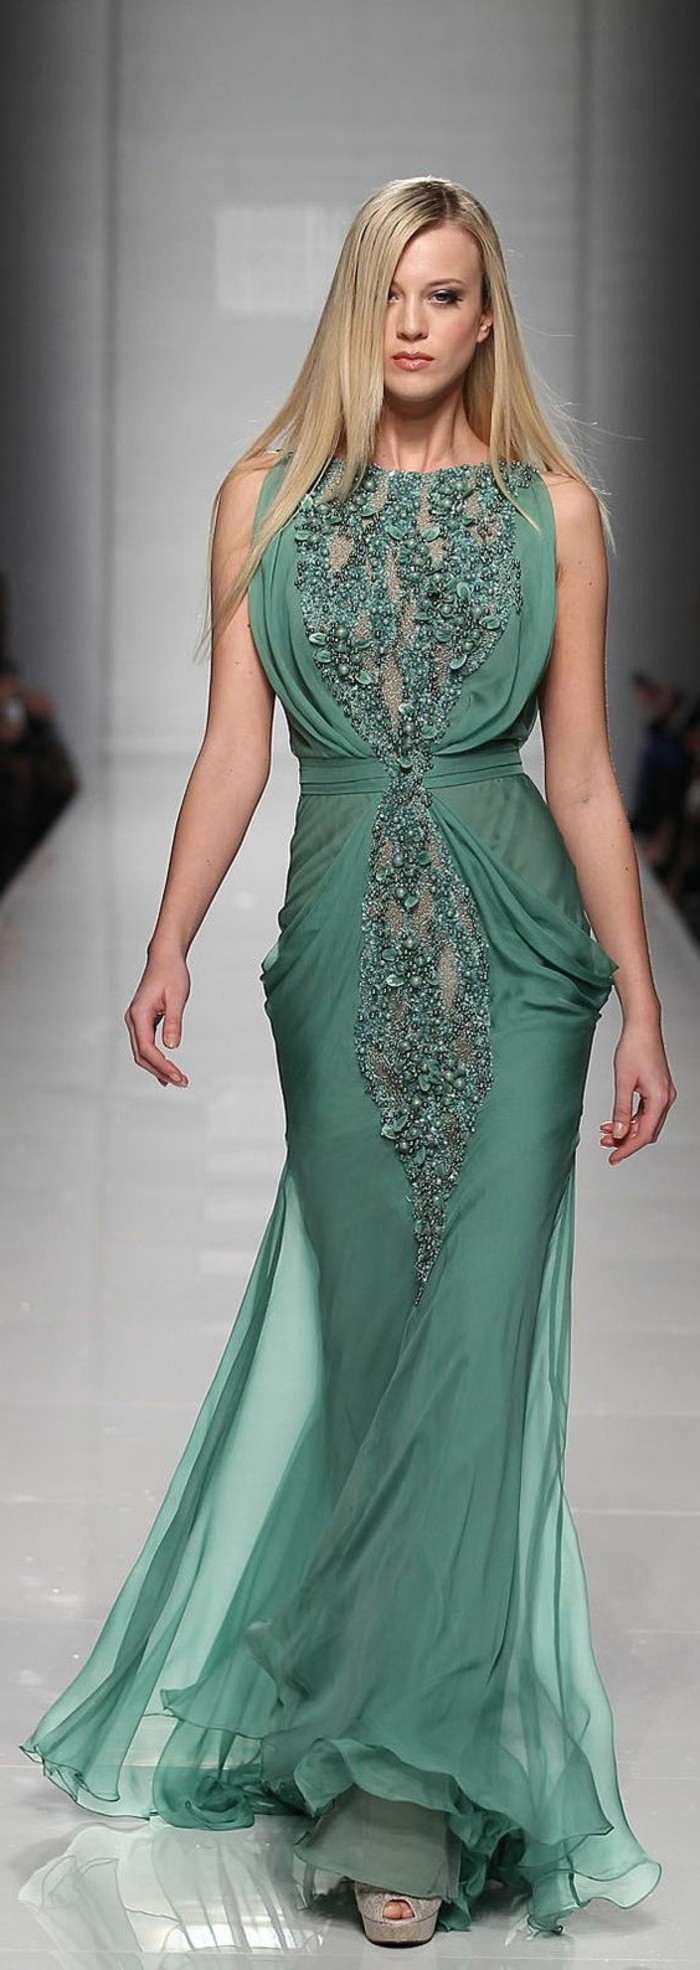 Elegante-Kleider-grün-haute-couture